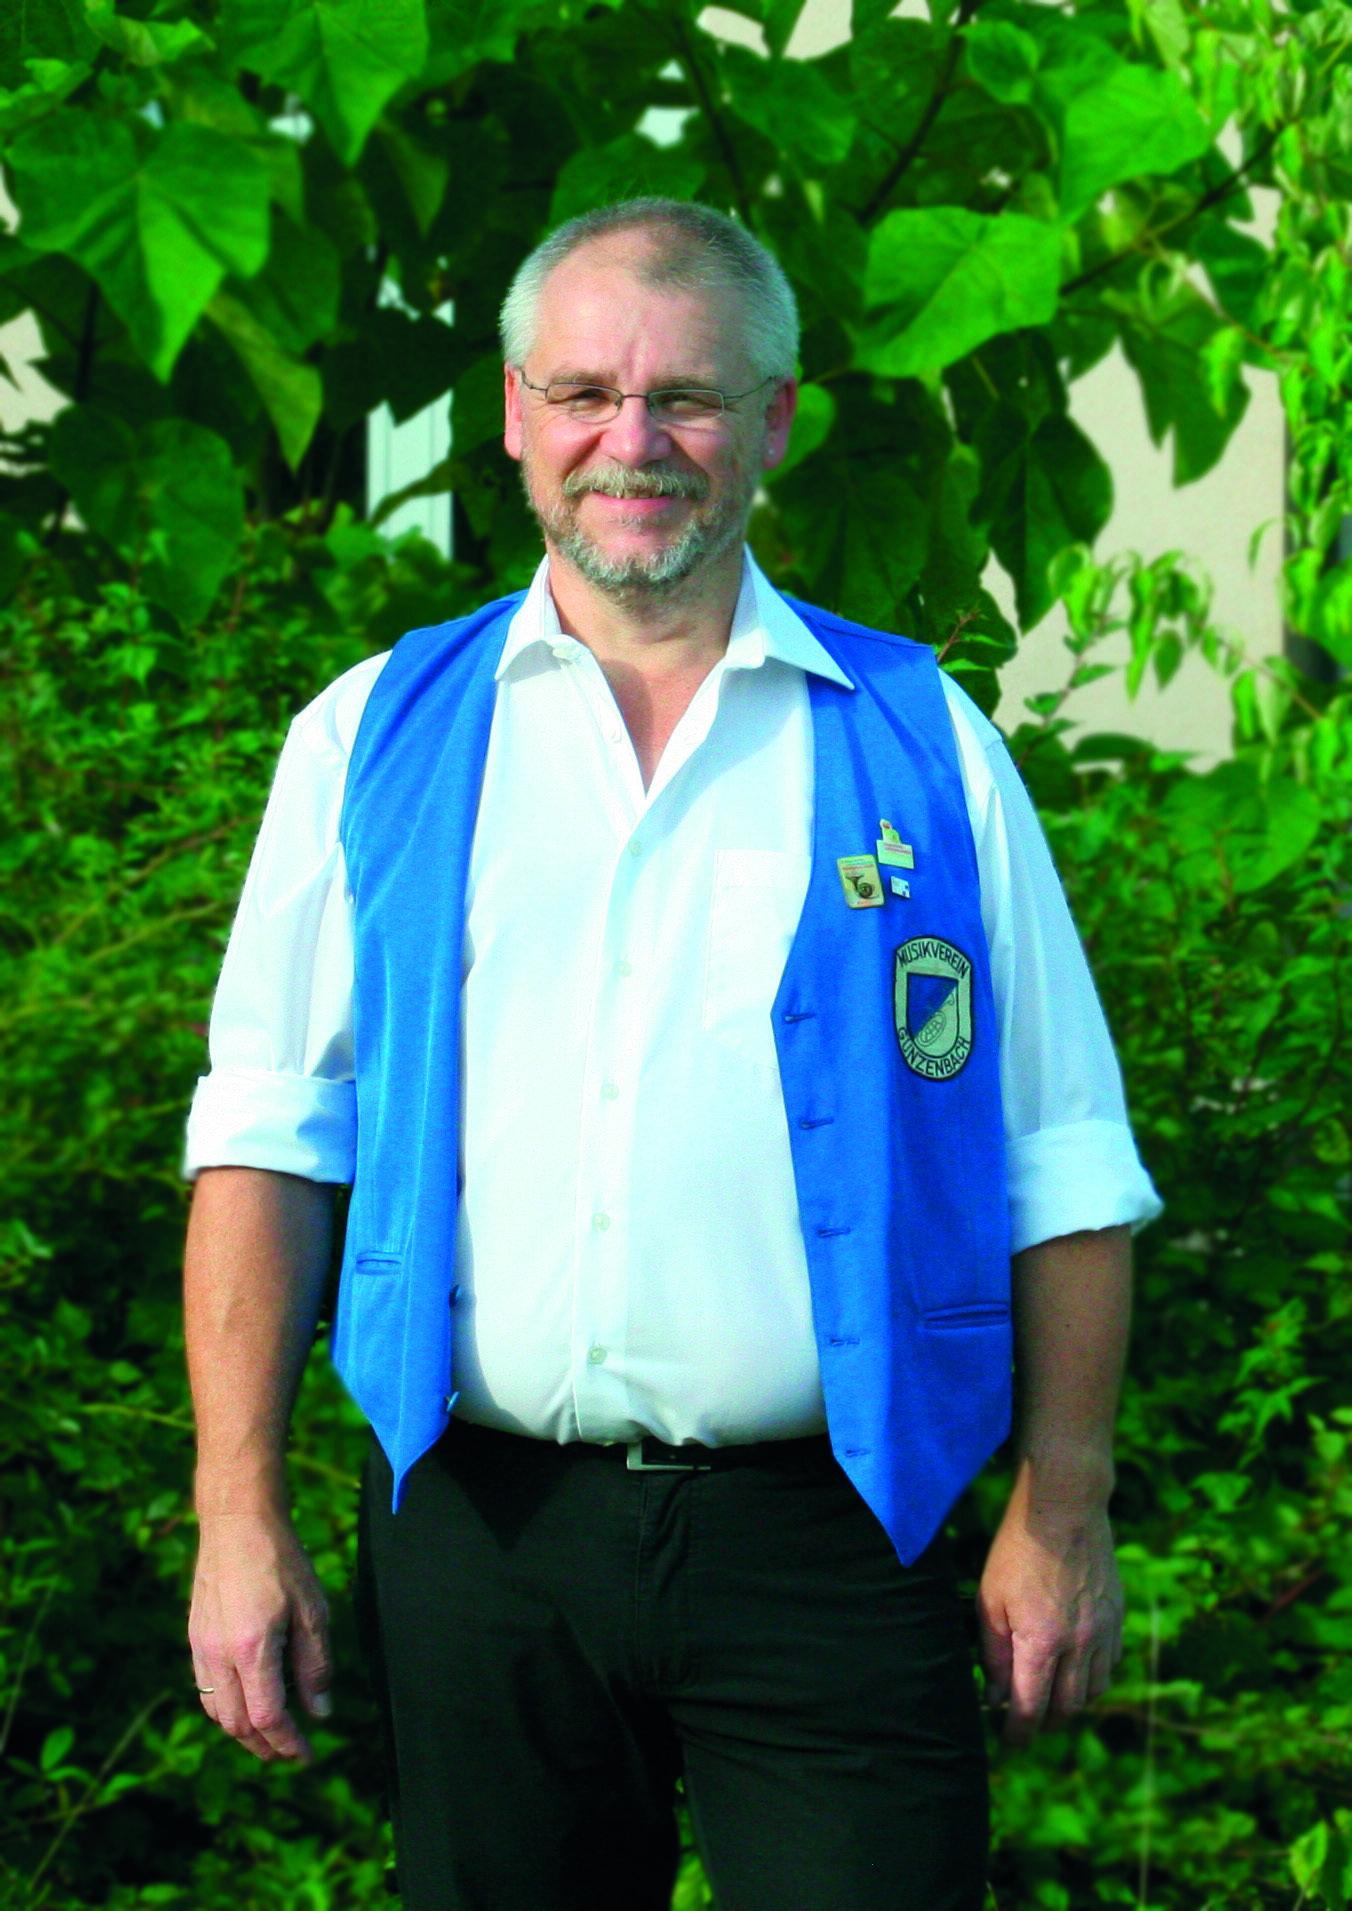 Markus Zlotos